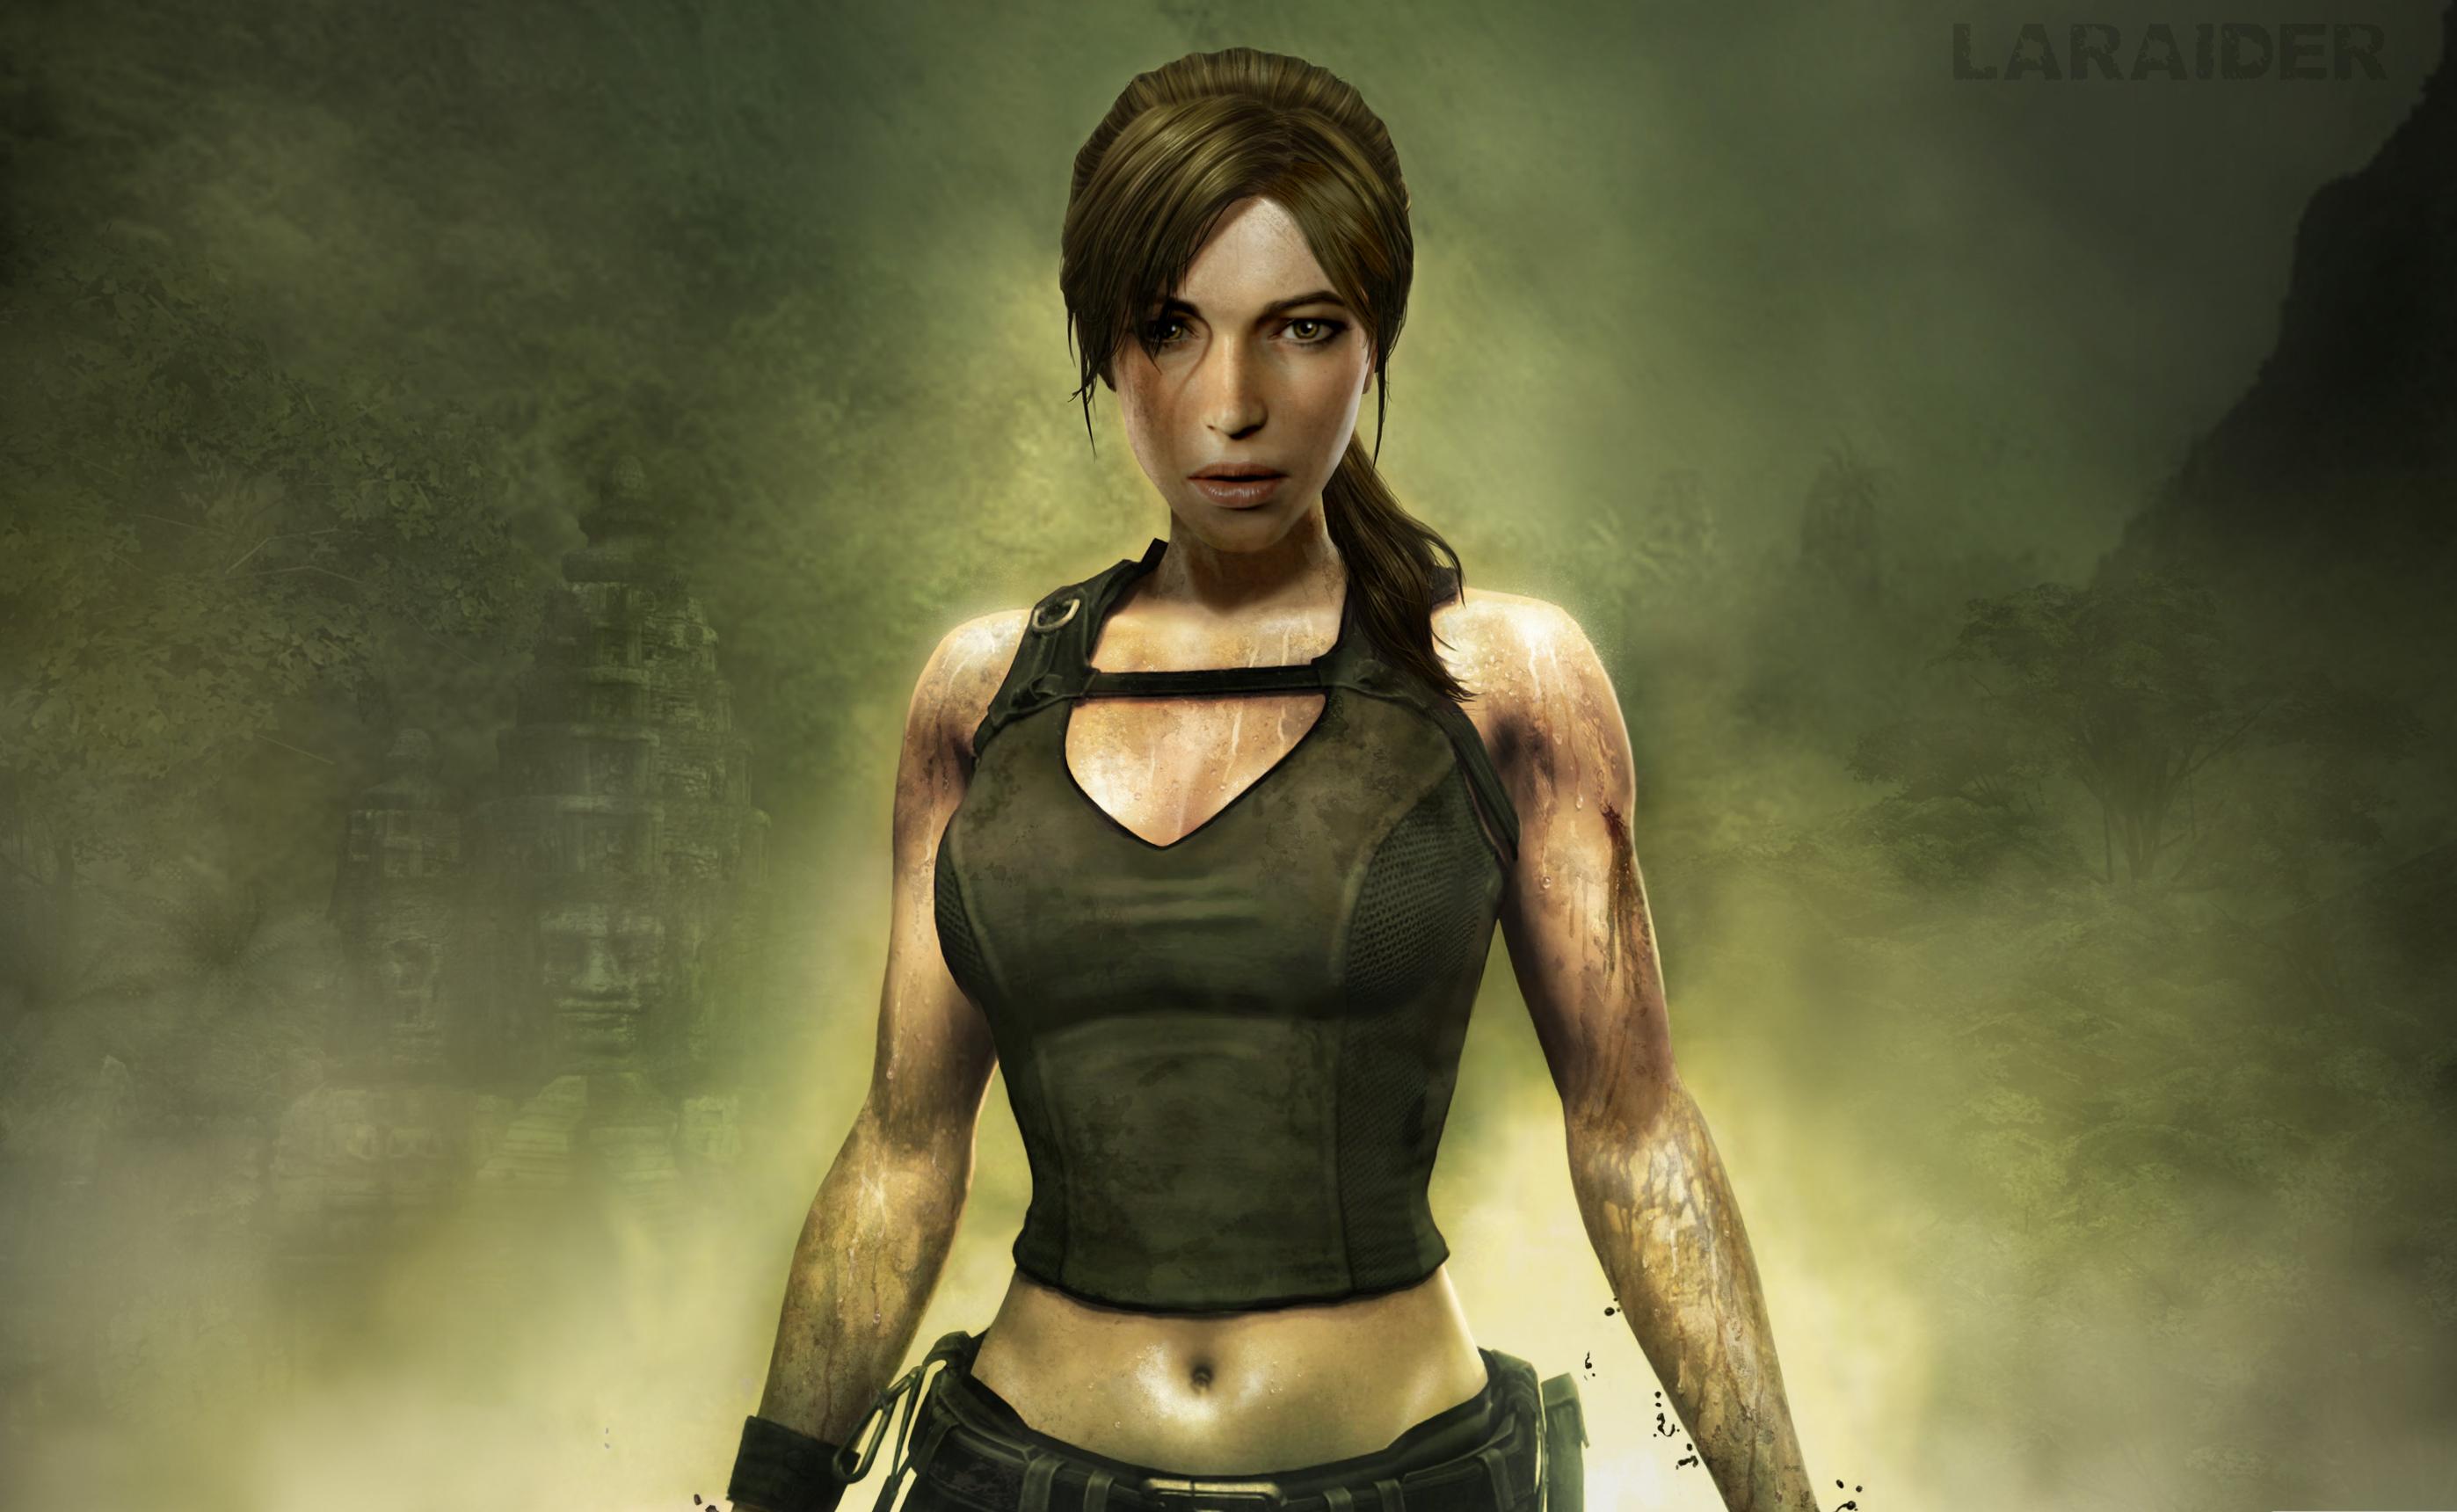 [Laraider] Montage Lara Croft 52 by laraider-com